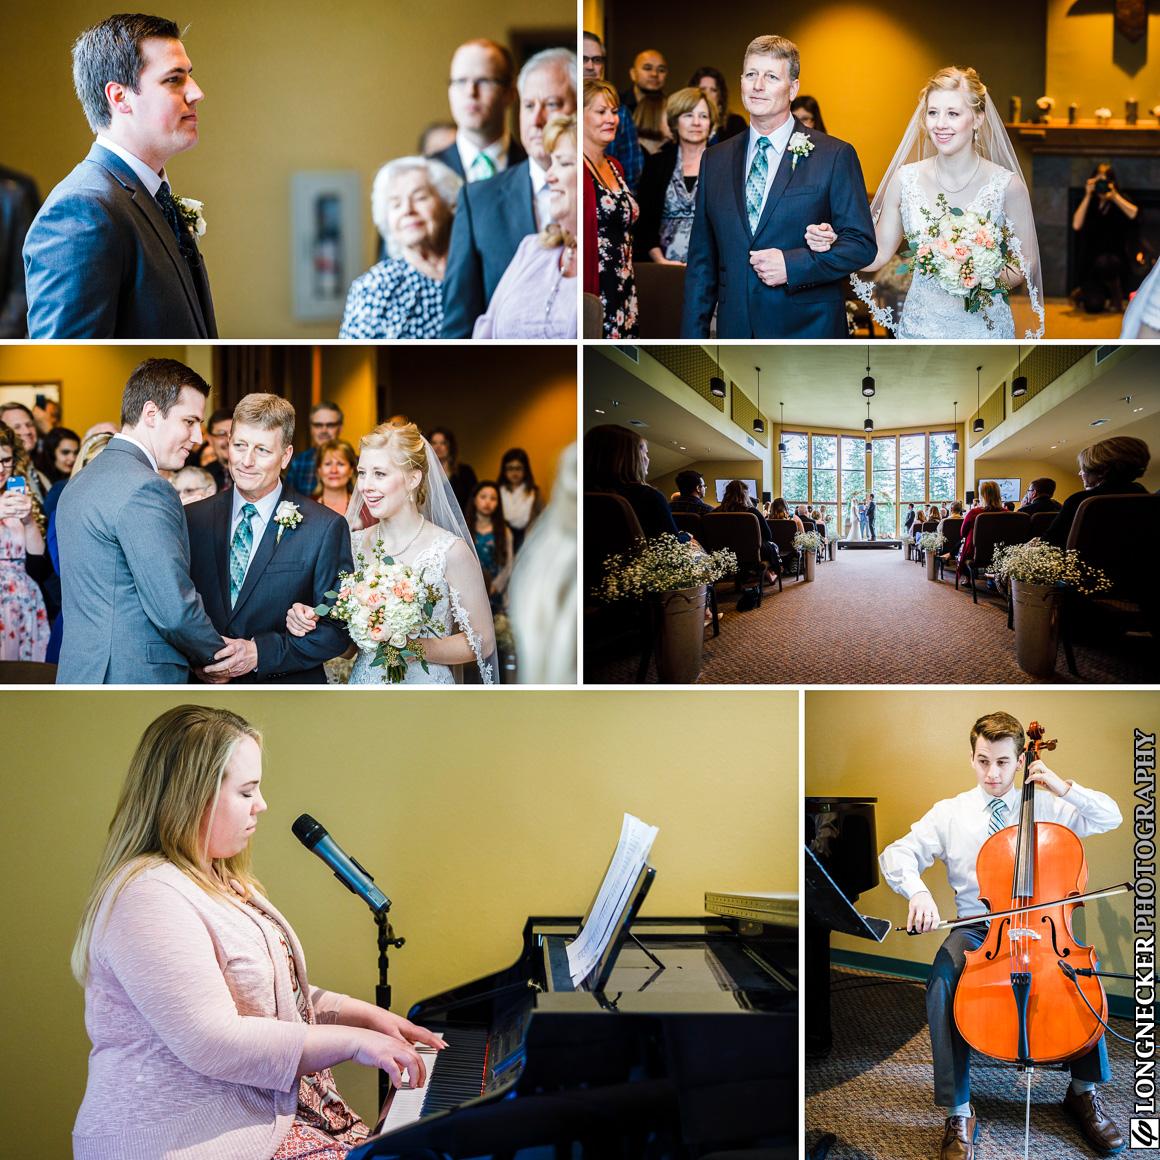 Christian wedding